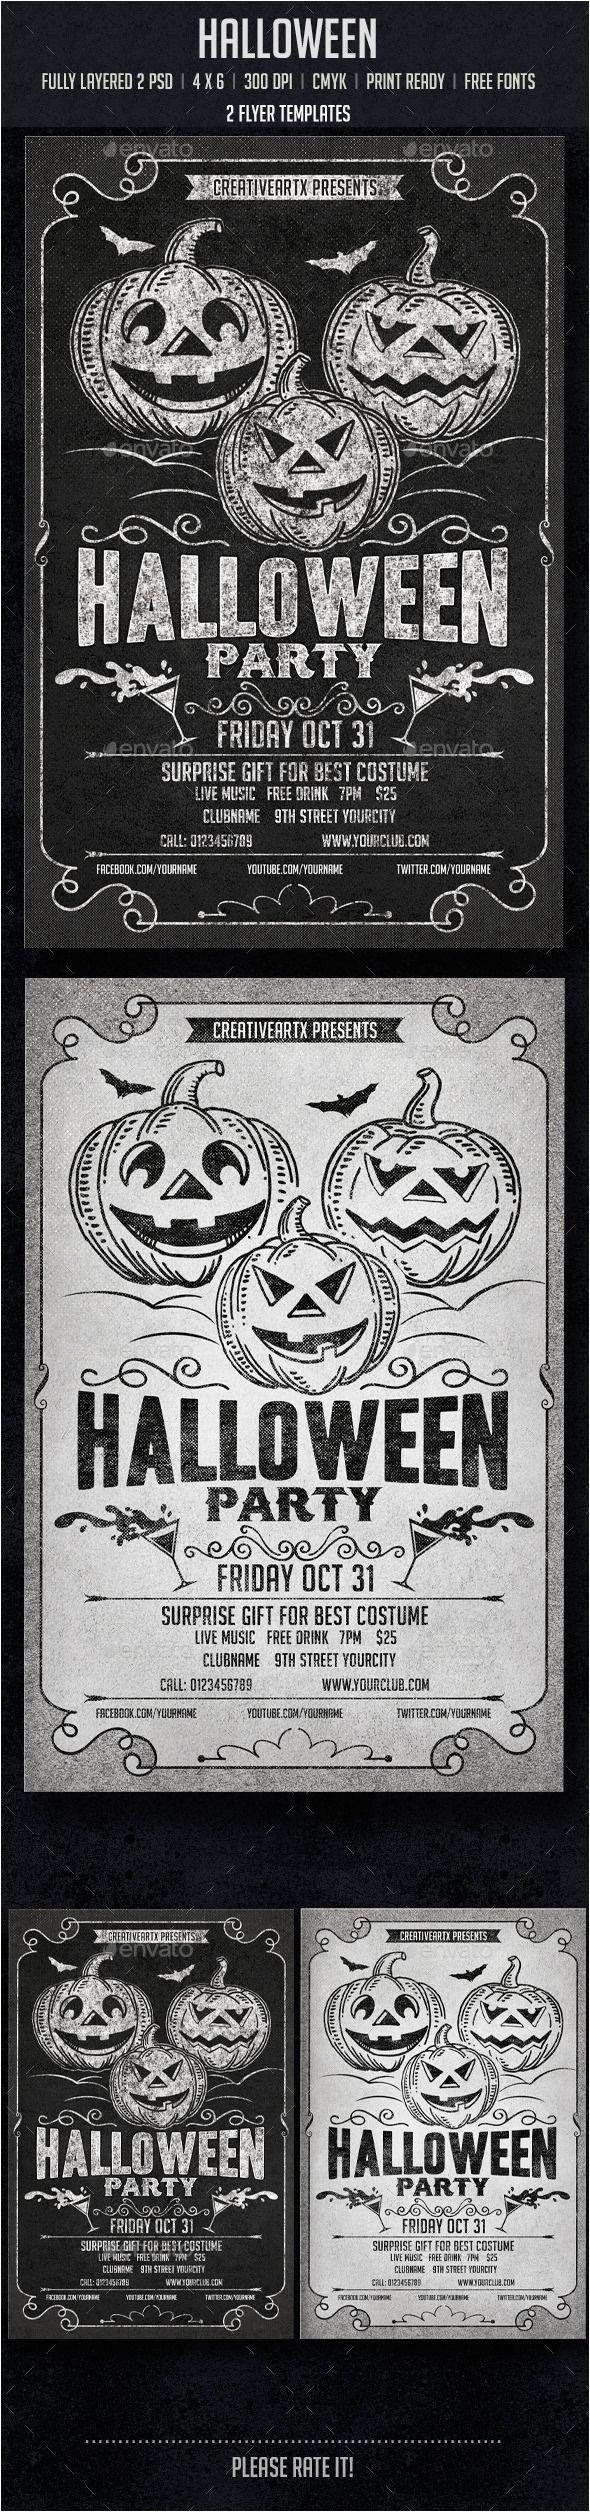 Vaudeville Poster Template Best 25 Vintage Halloween Posters Ideas On Pinterest